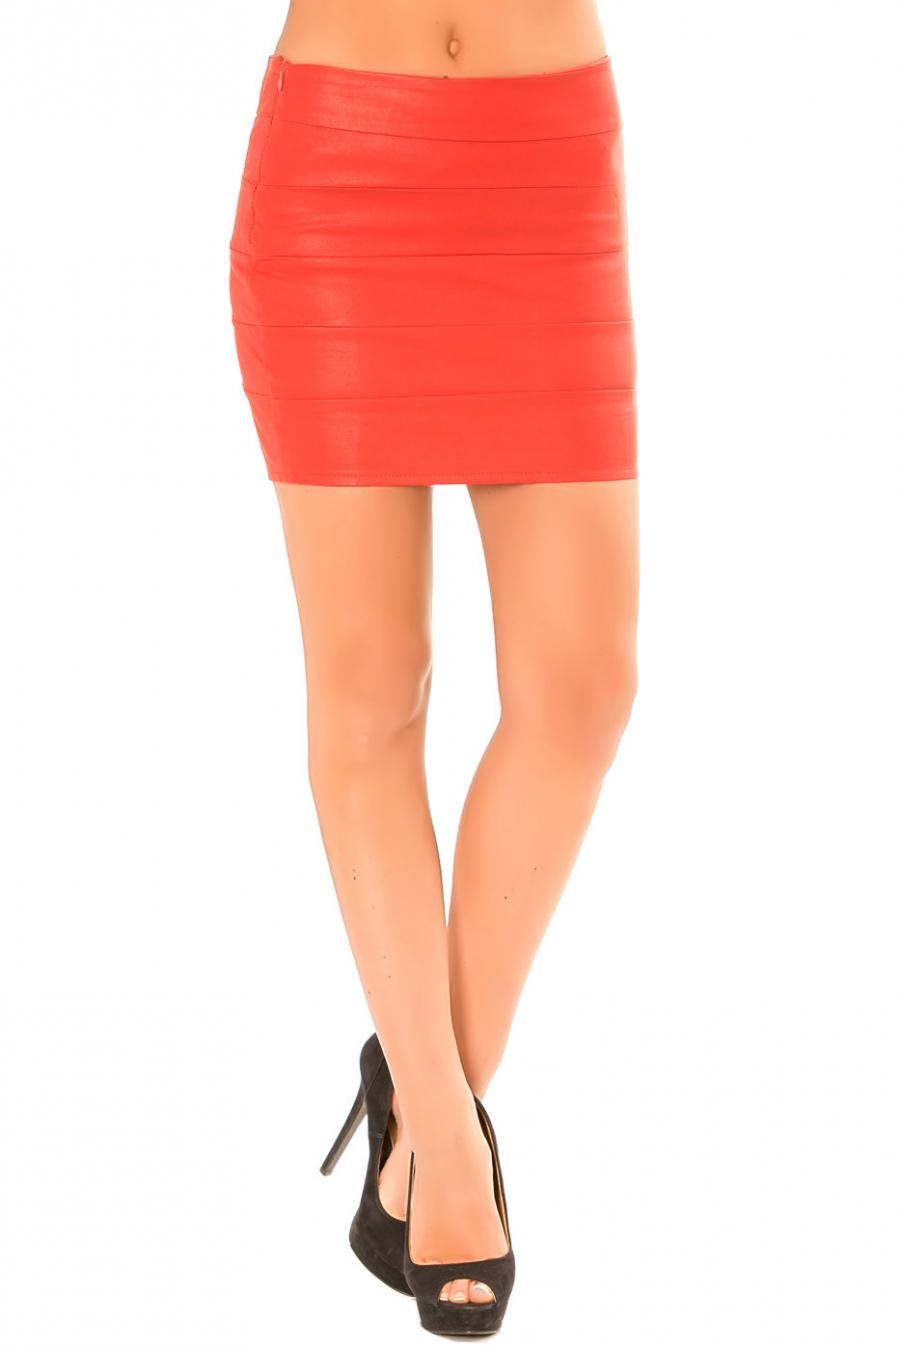 Mini jupe rouge en simili côtelé. Jupe Sexy. 626